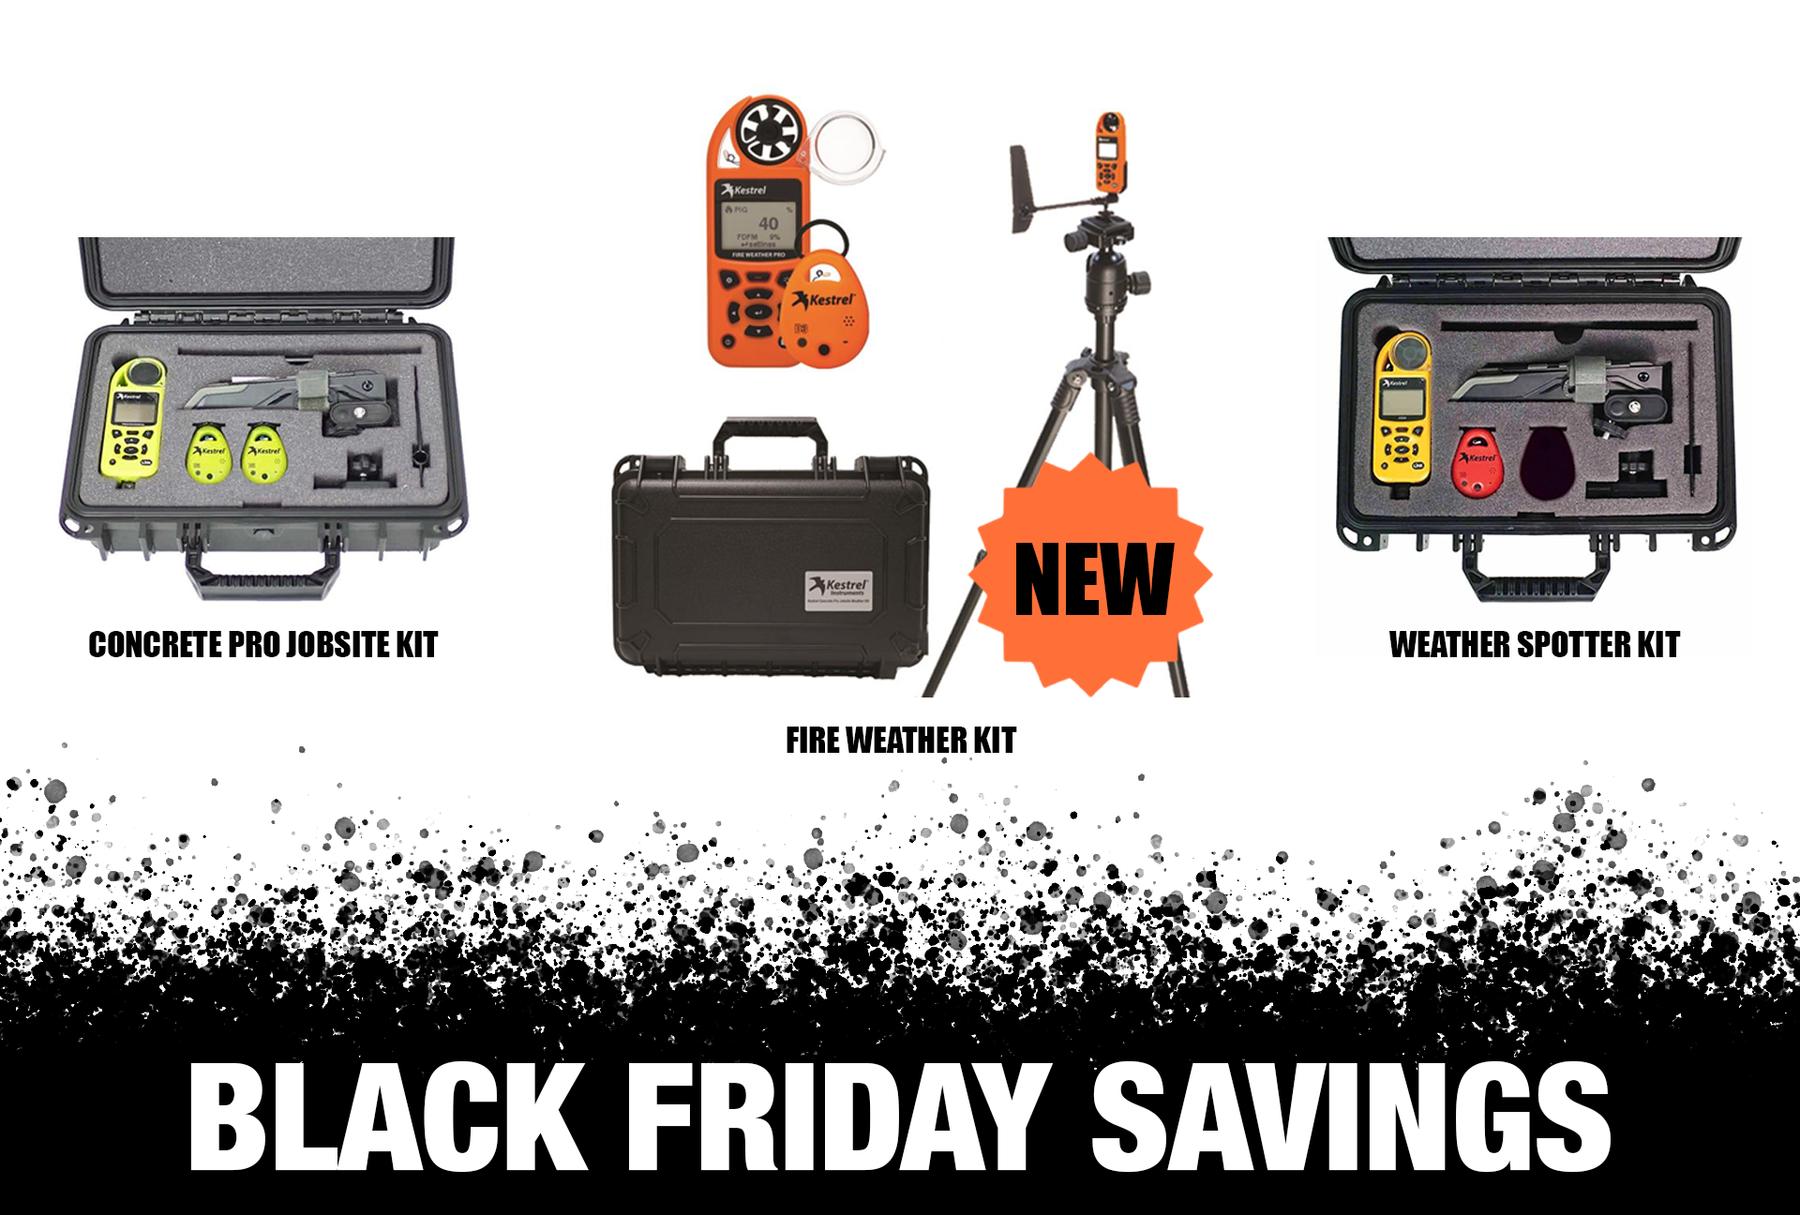 Black Friday Savings Kits